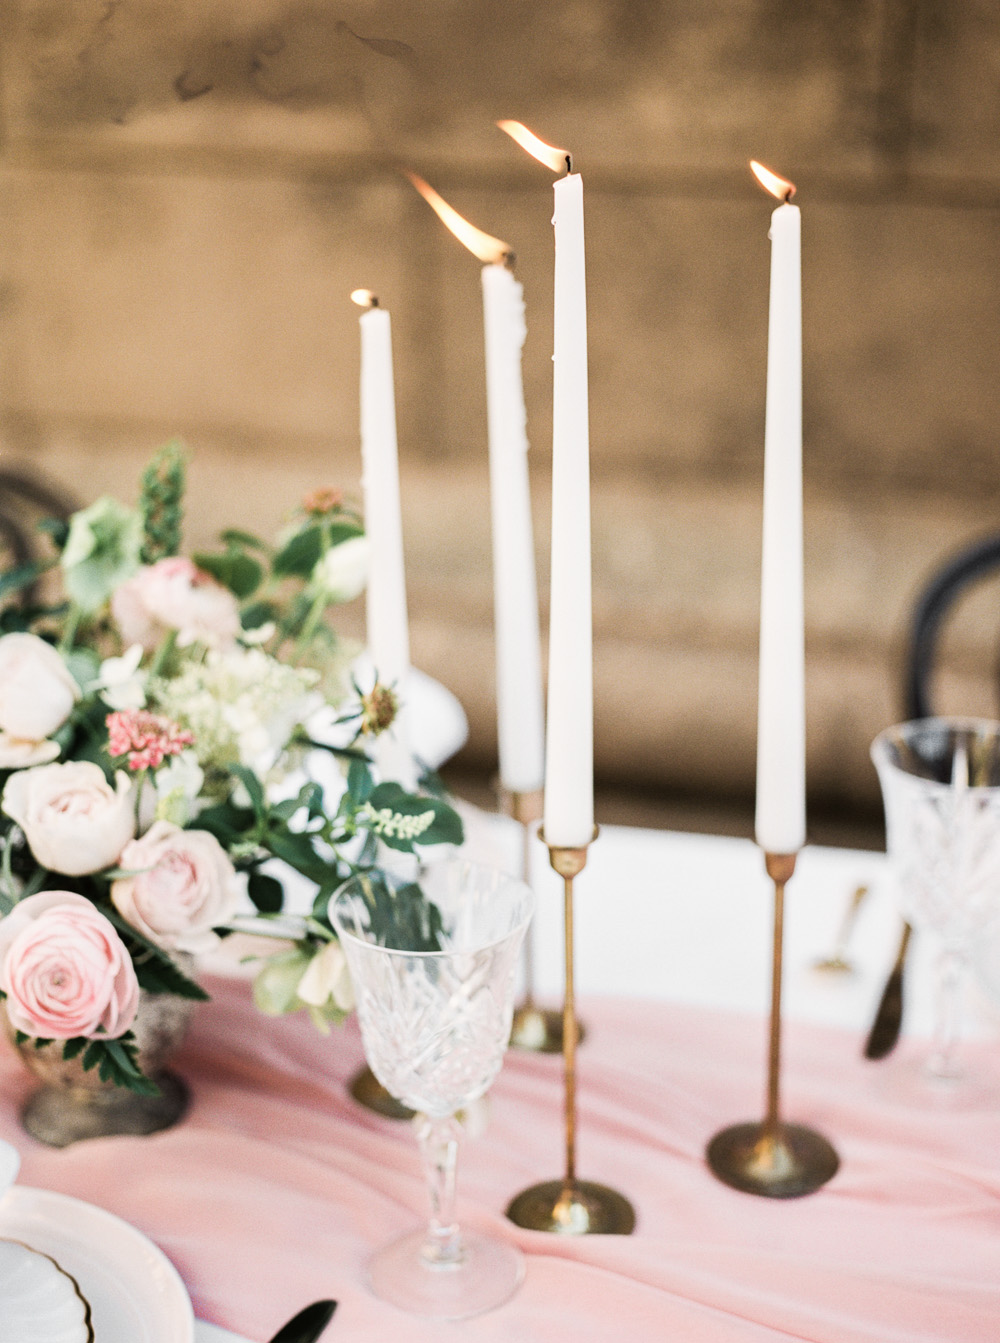 Pink and blush wedding inspiration  | by Lara Lam photography